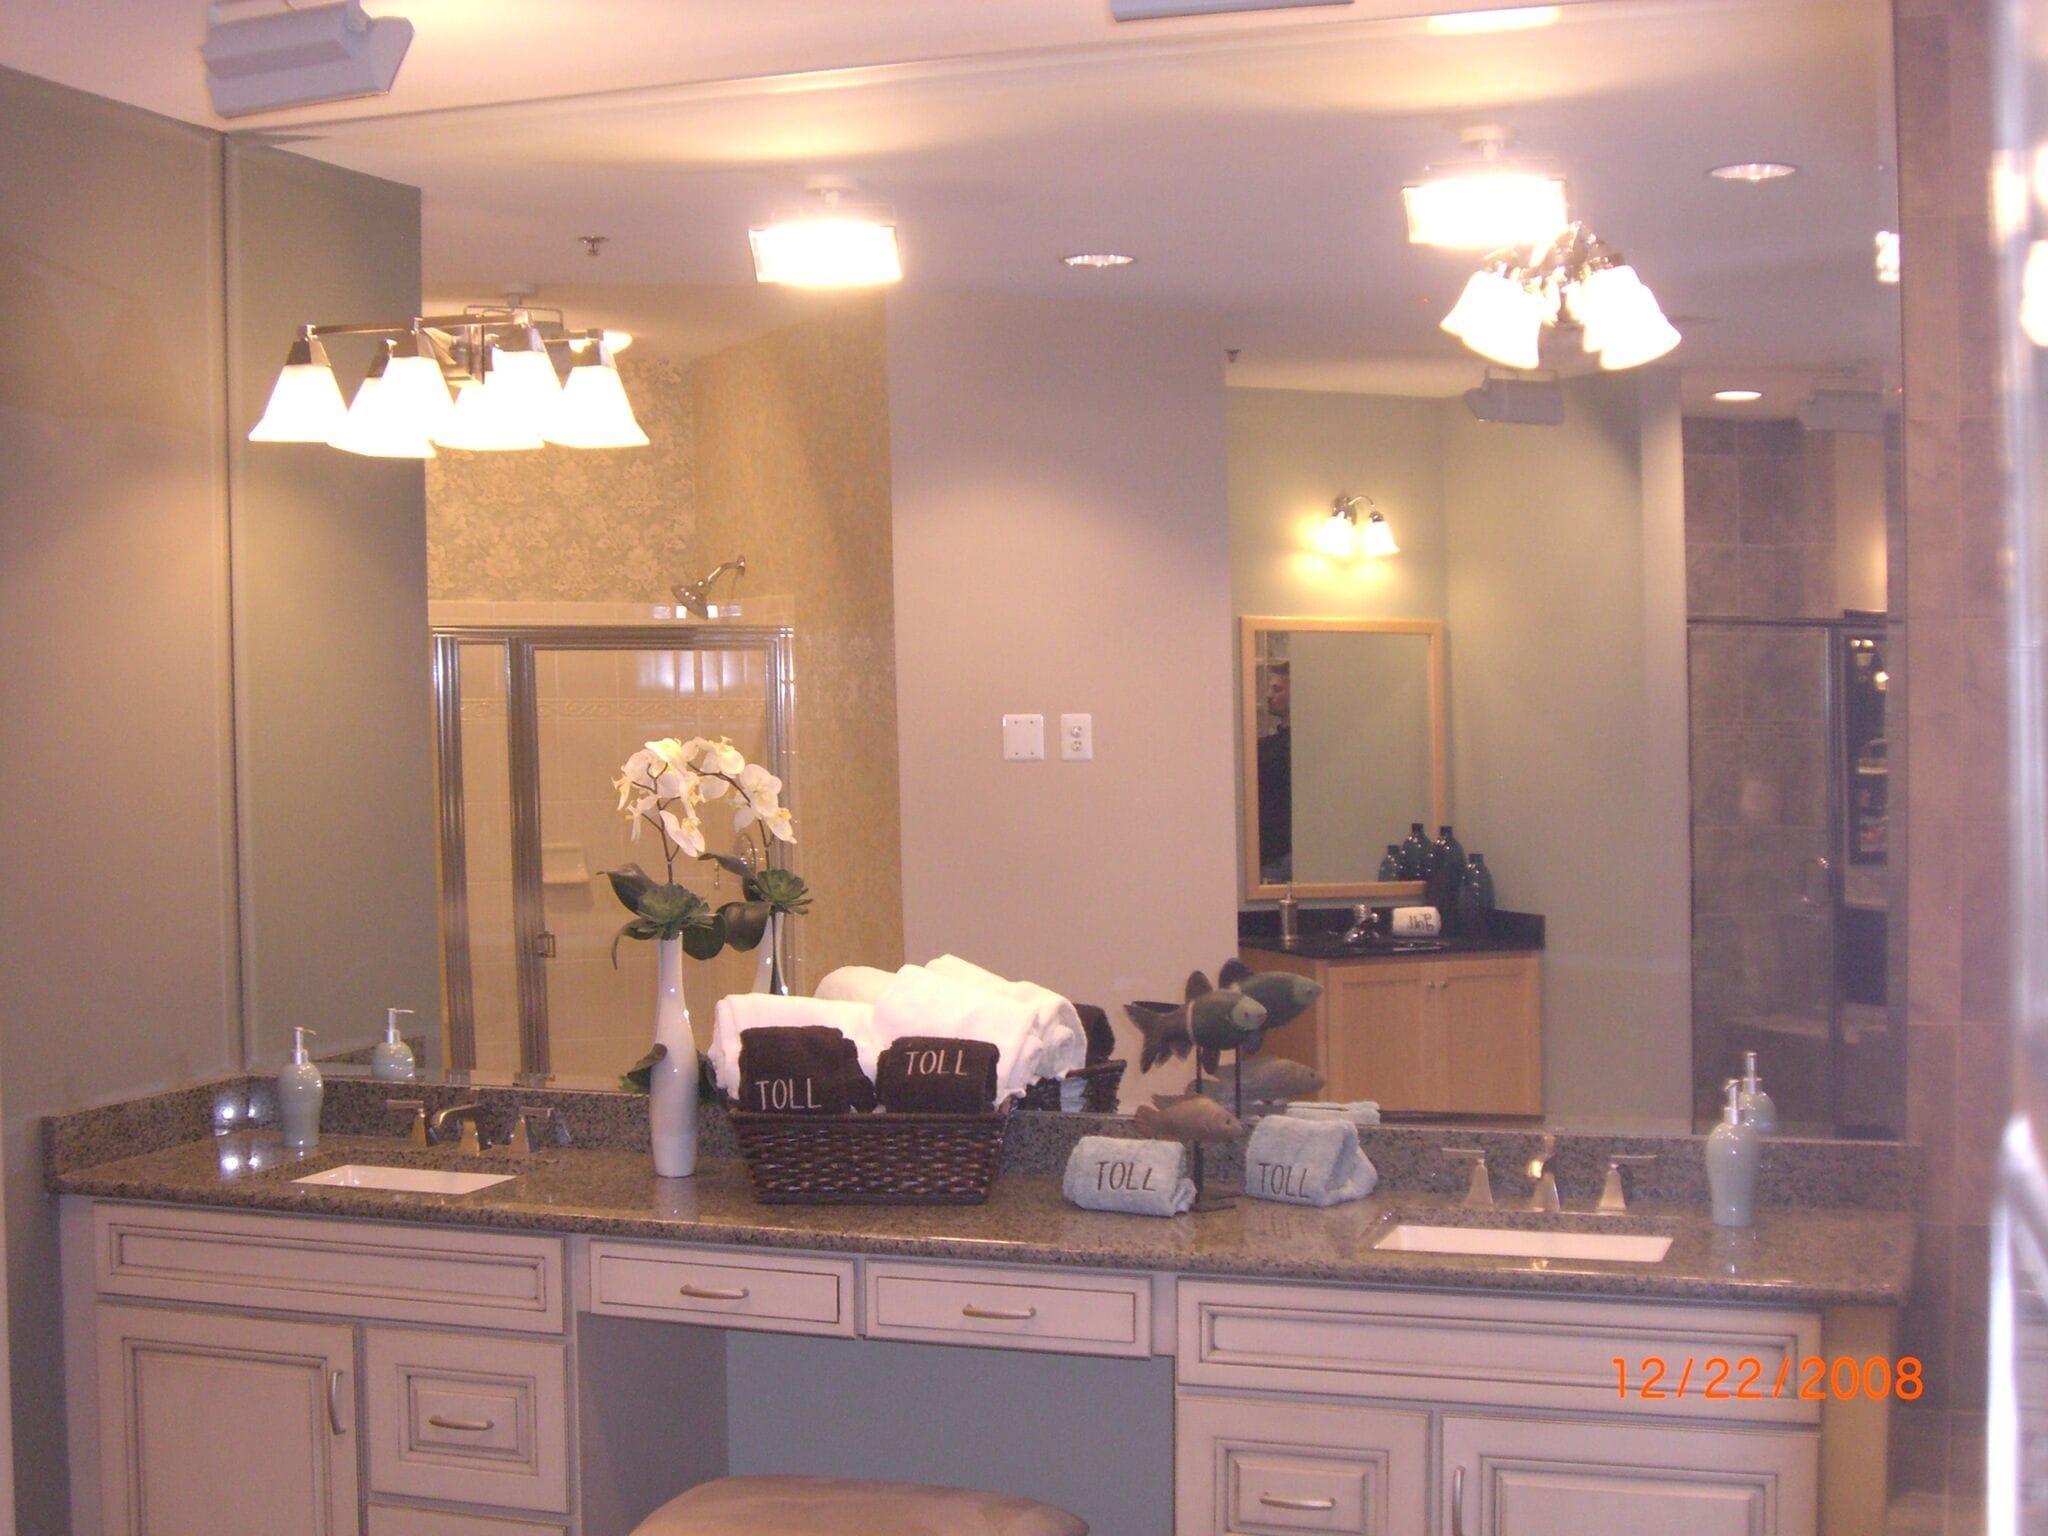 Bathroom Vanity Mirror W Light Cutouts Min Bathroomvanitymirrors